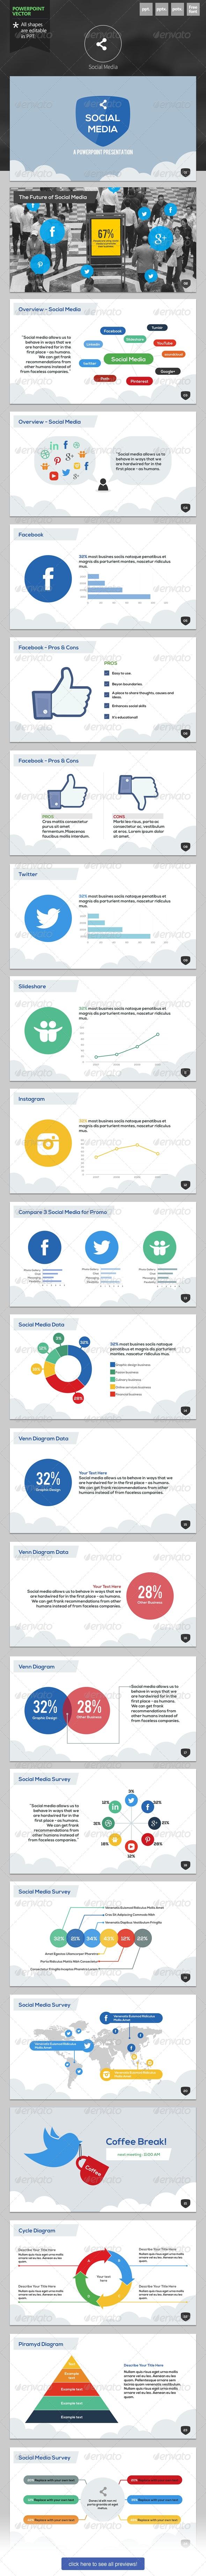 Social Media - Powerpoint Template - PowerPoint Templates Presentation Templates